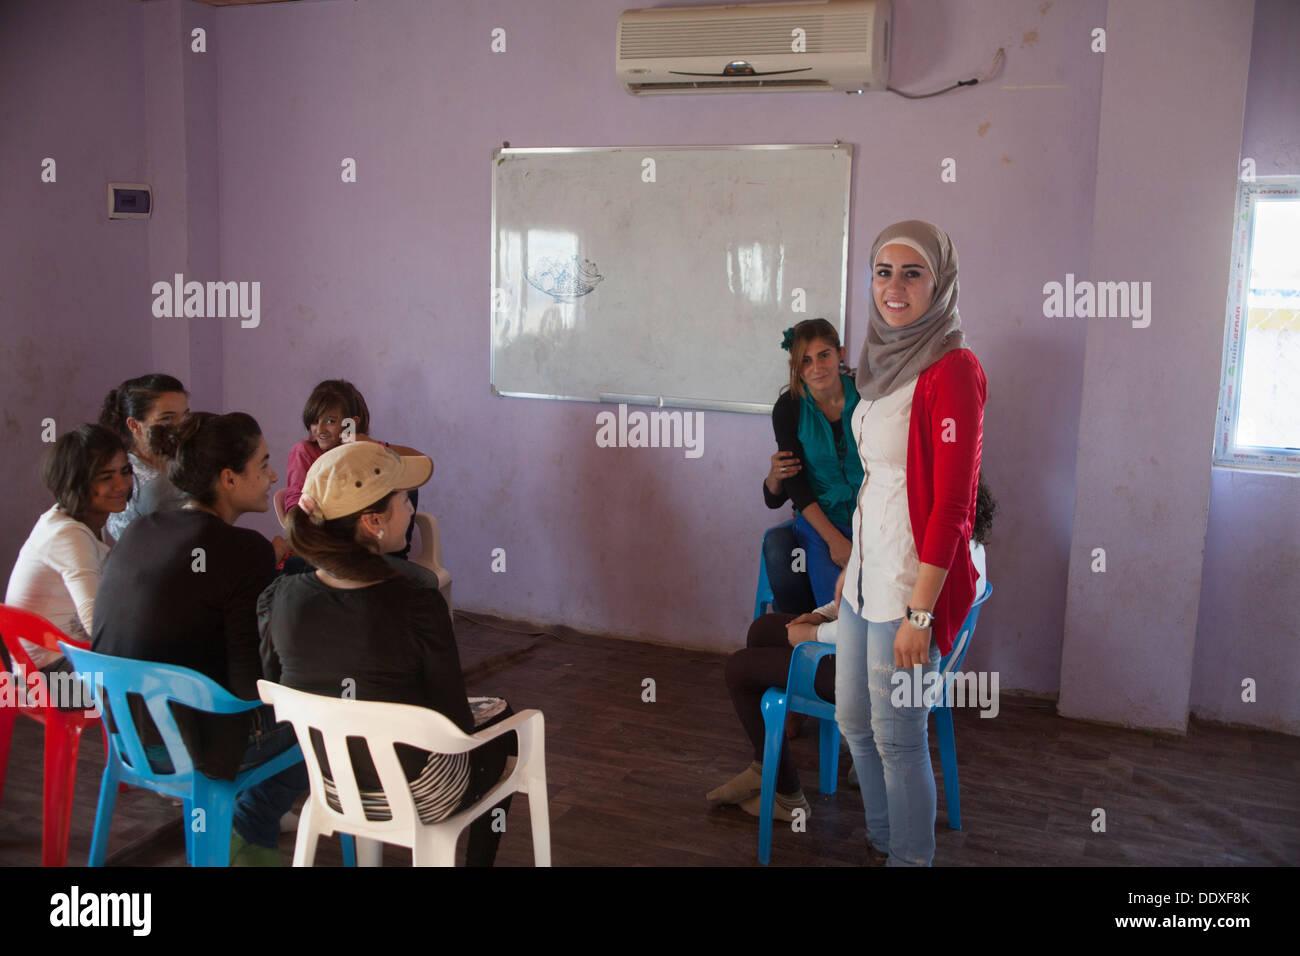 Domiz, Duhok province - Northern Iraq (Iraqi Kurdistan) - Domiz Refugees Camp Education is provided by the governorate of Kurdis - Stock Image